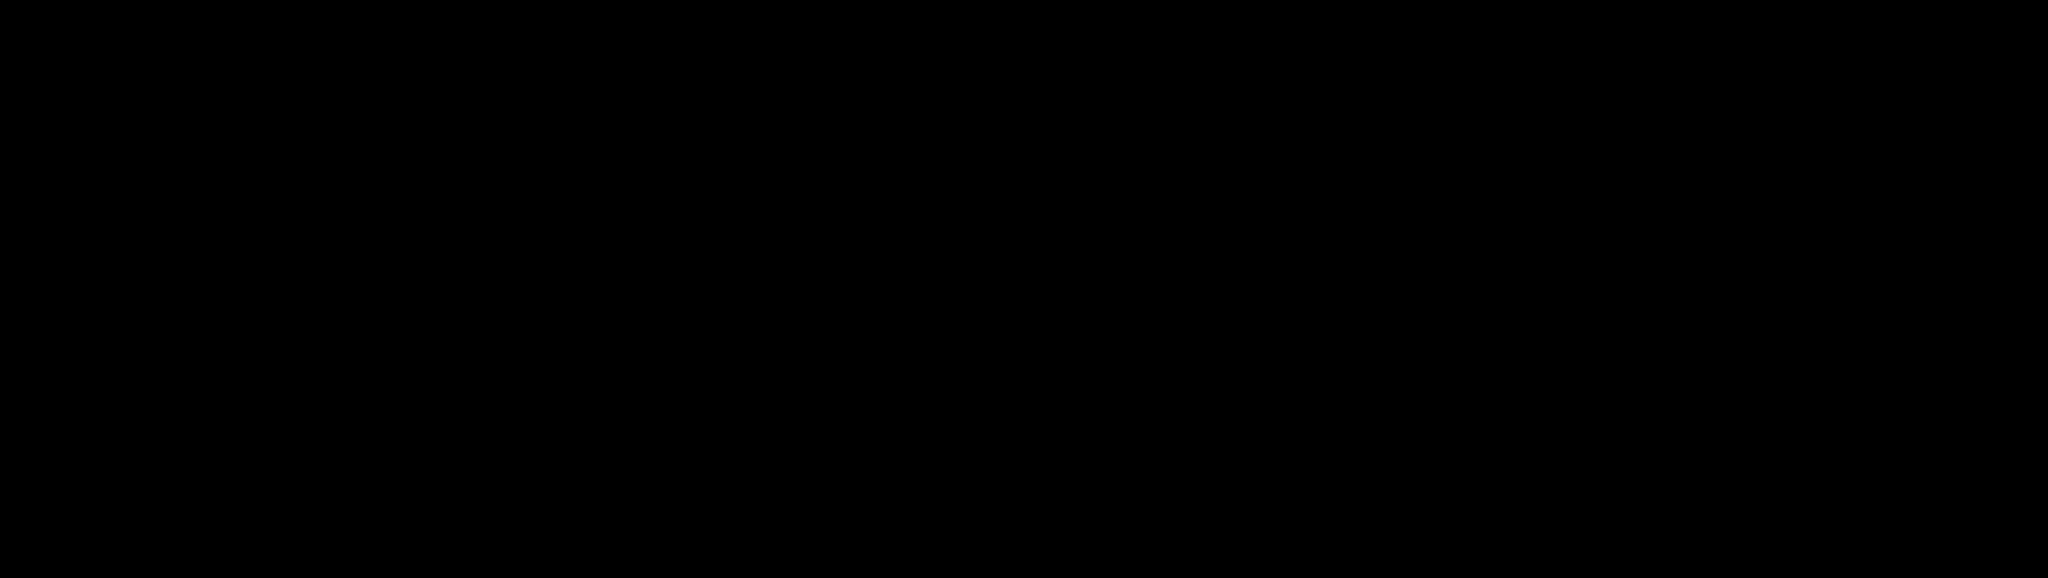 Rijnstraat logo